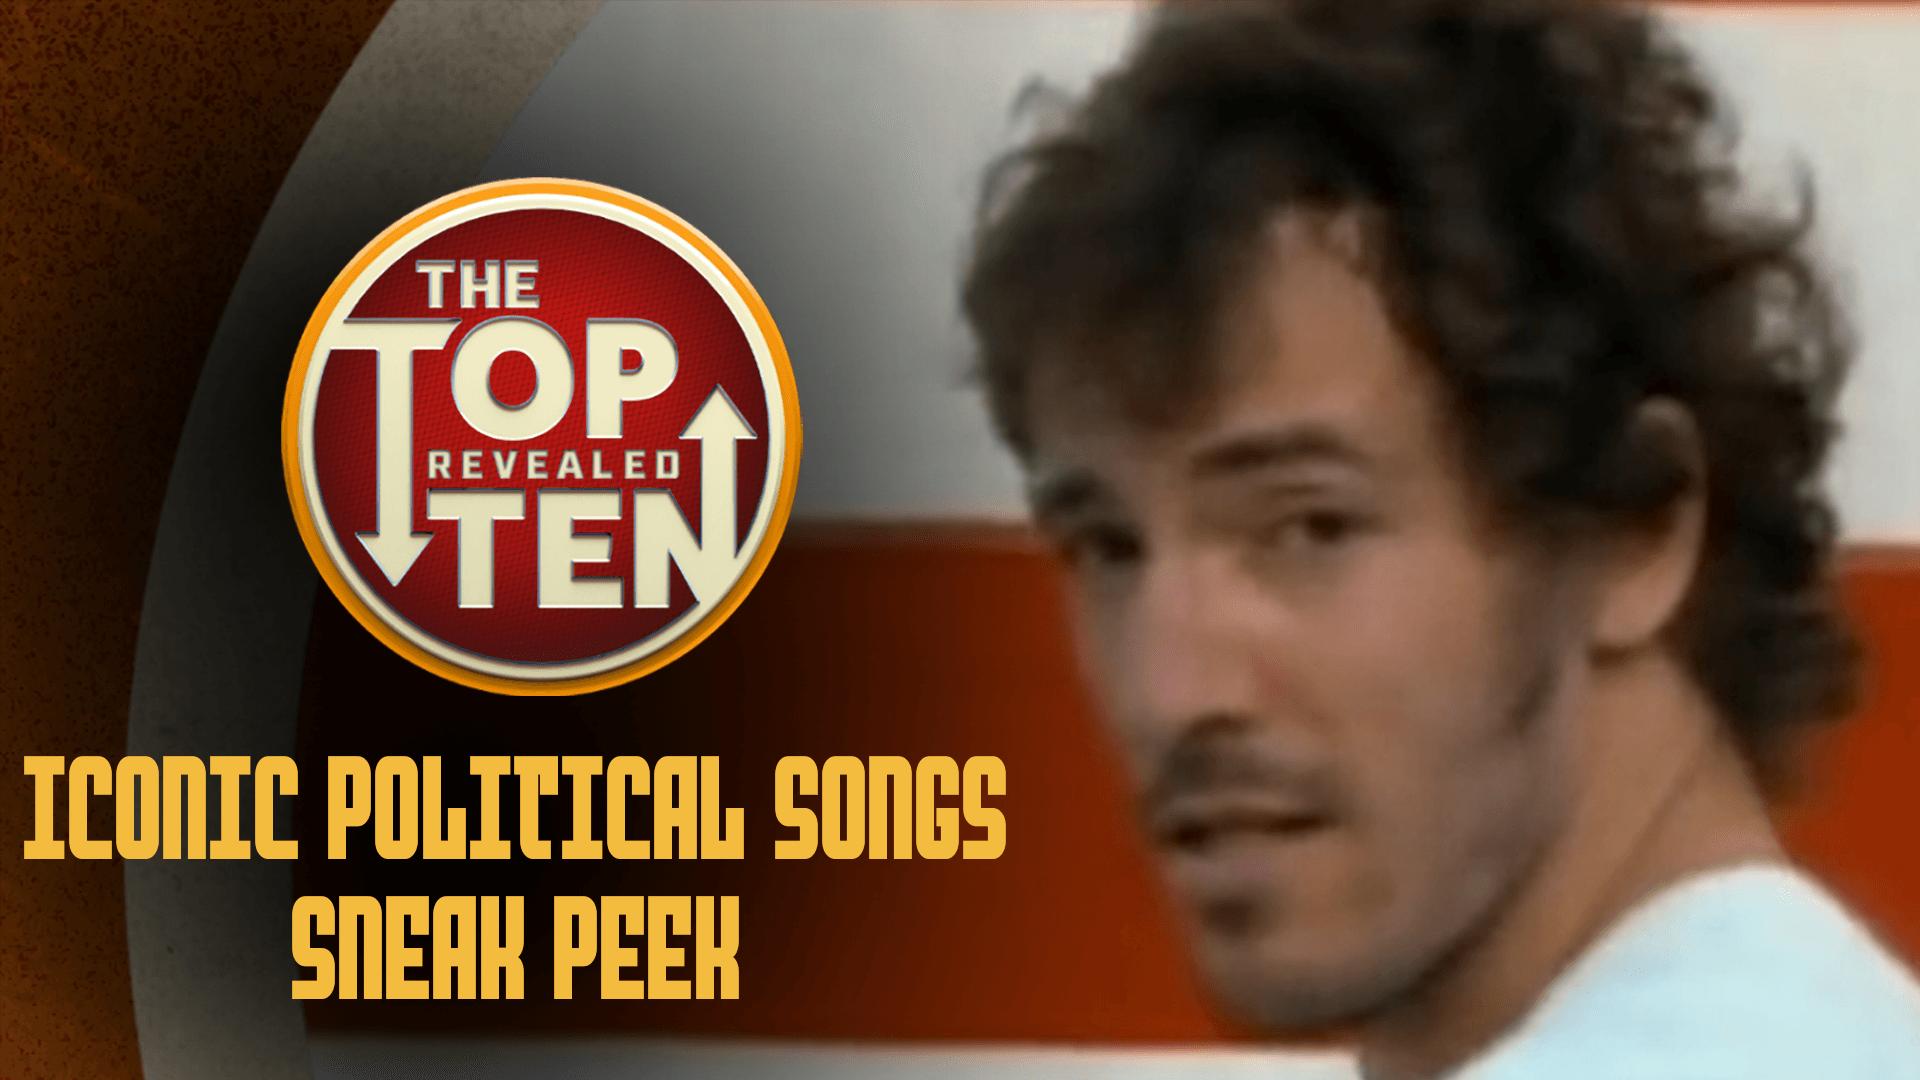 Iconic Political Songs Sneak Peek | The Top Ten Revealed